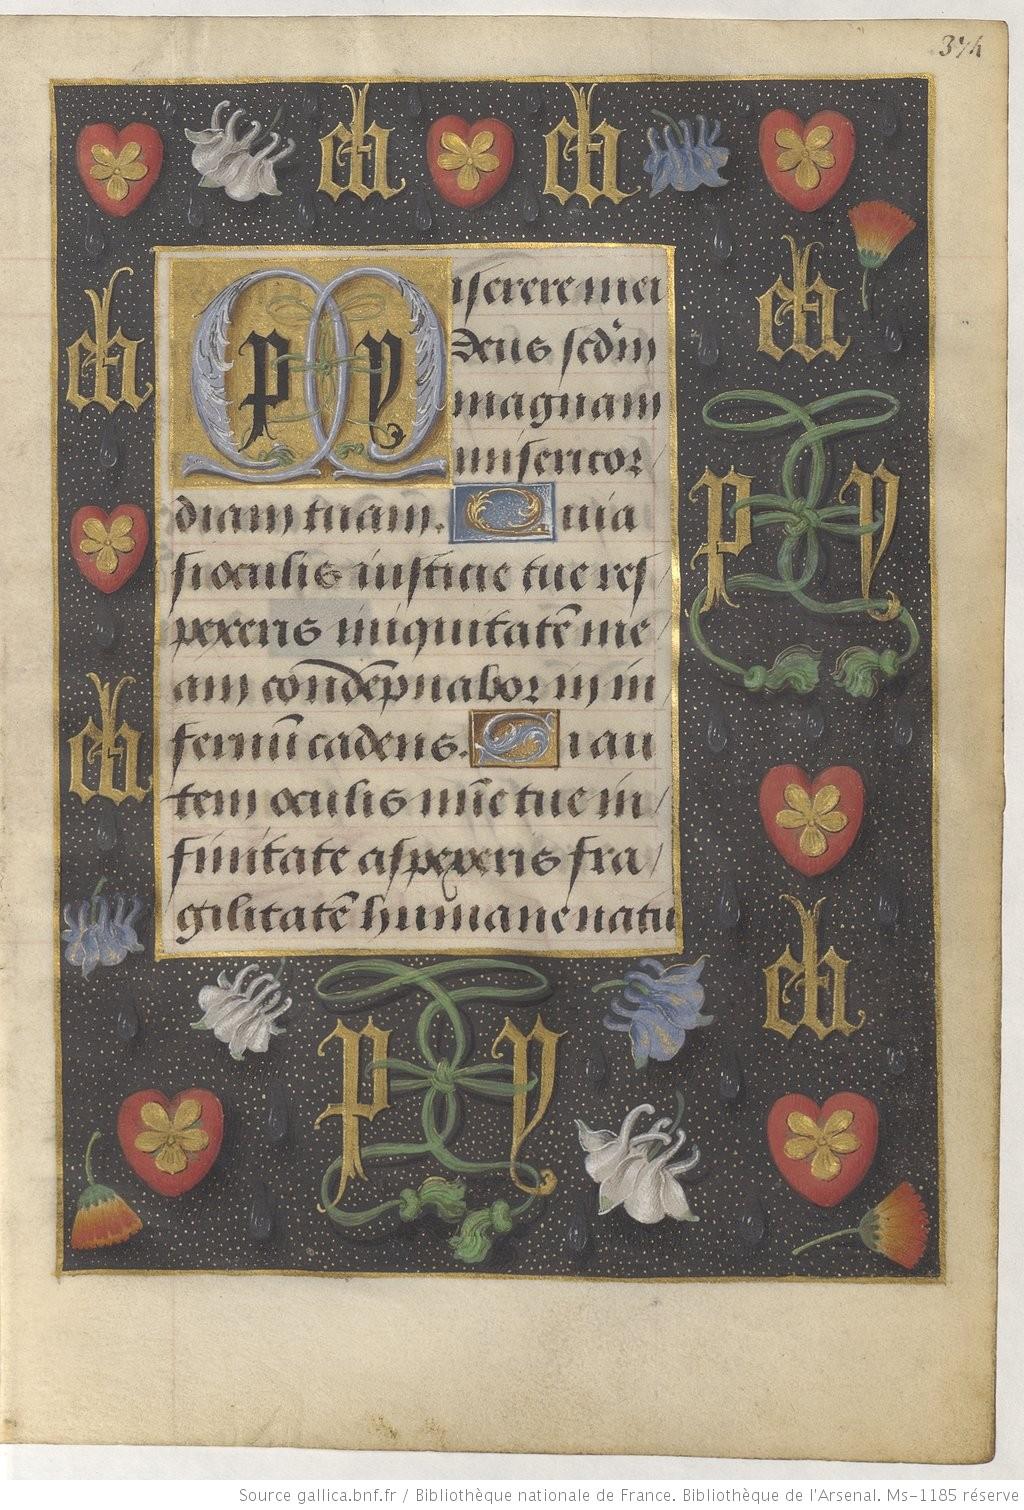 1490-96 Heures de Boussu, BNF Arsenal. Ms-1185 reserve fol 374r Gallica PV eh